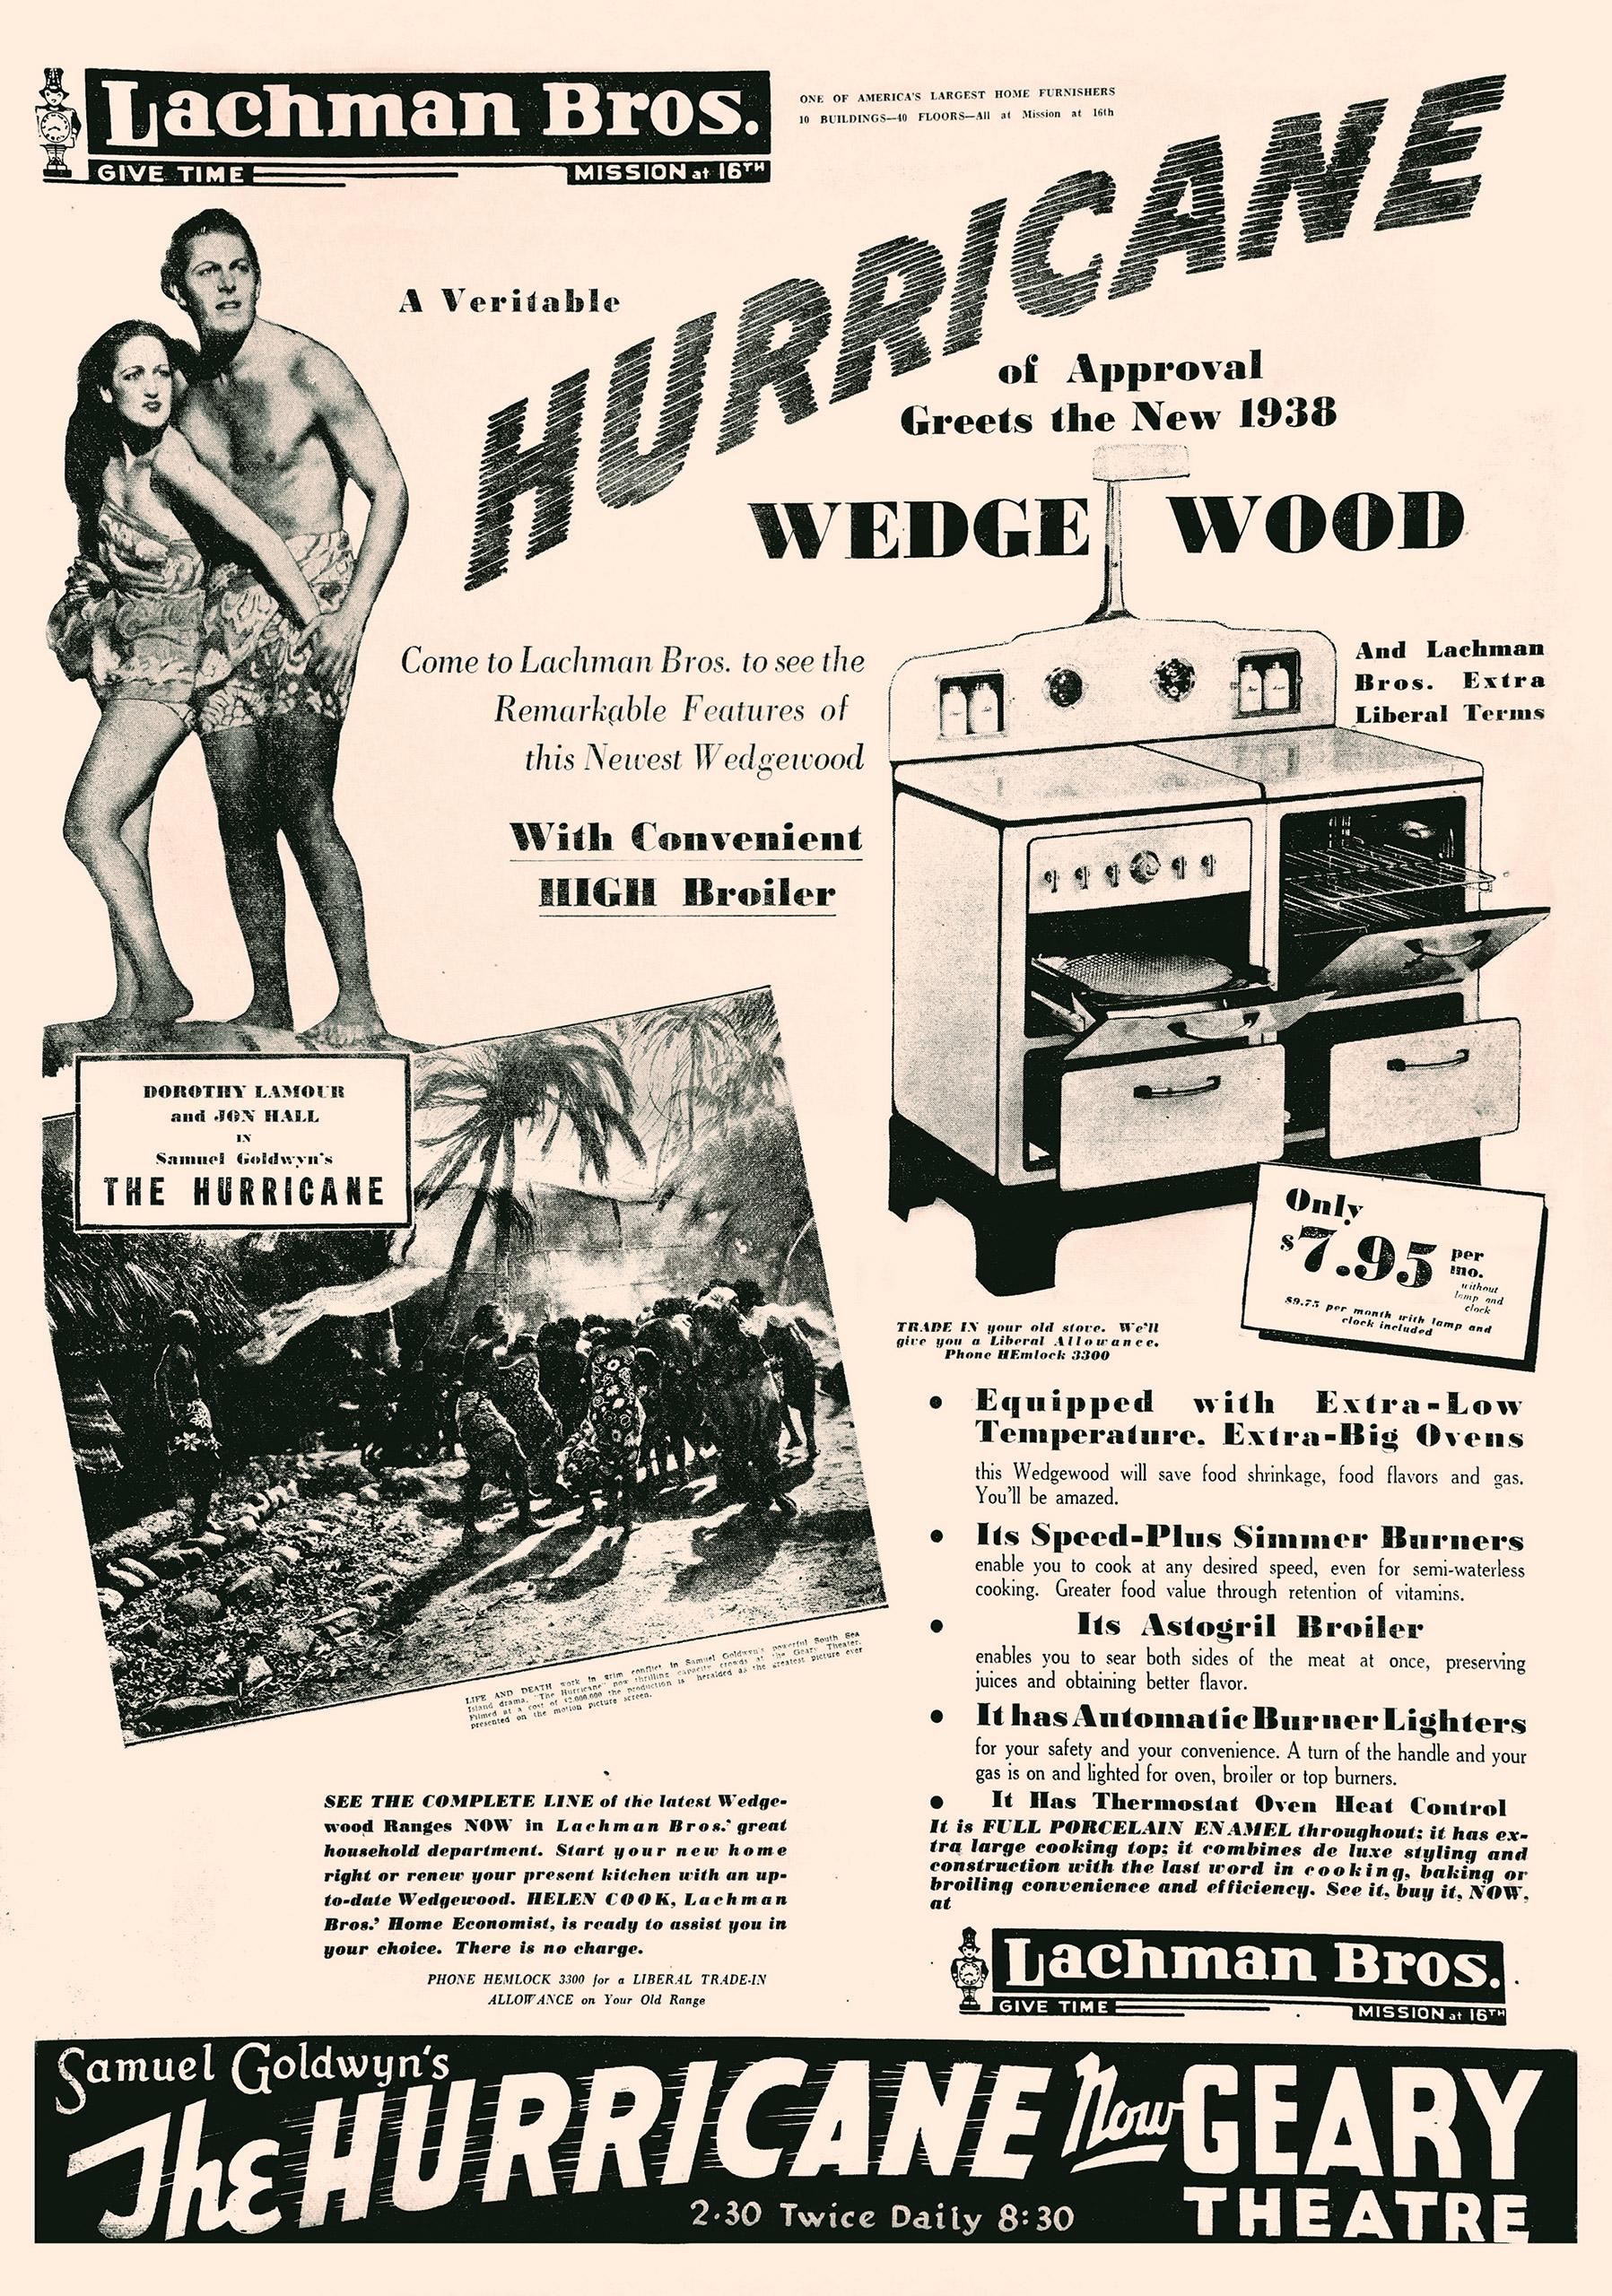 The Hurricane newspaper advertisement, 1937.